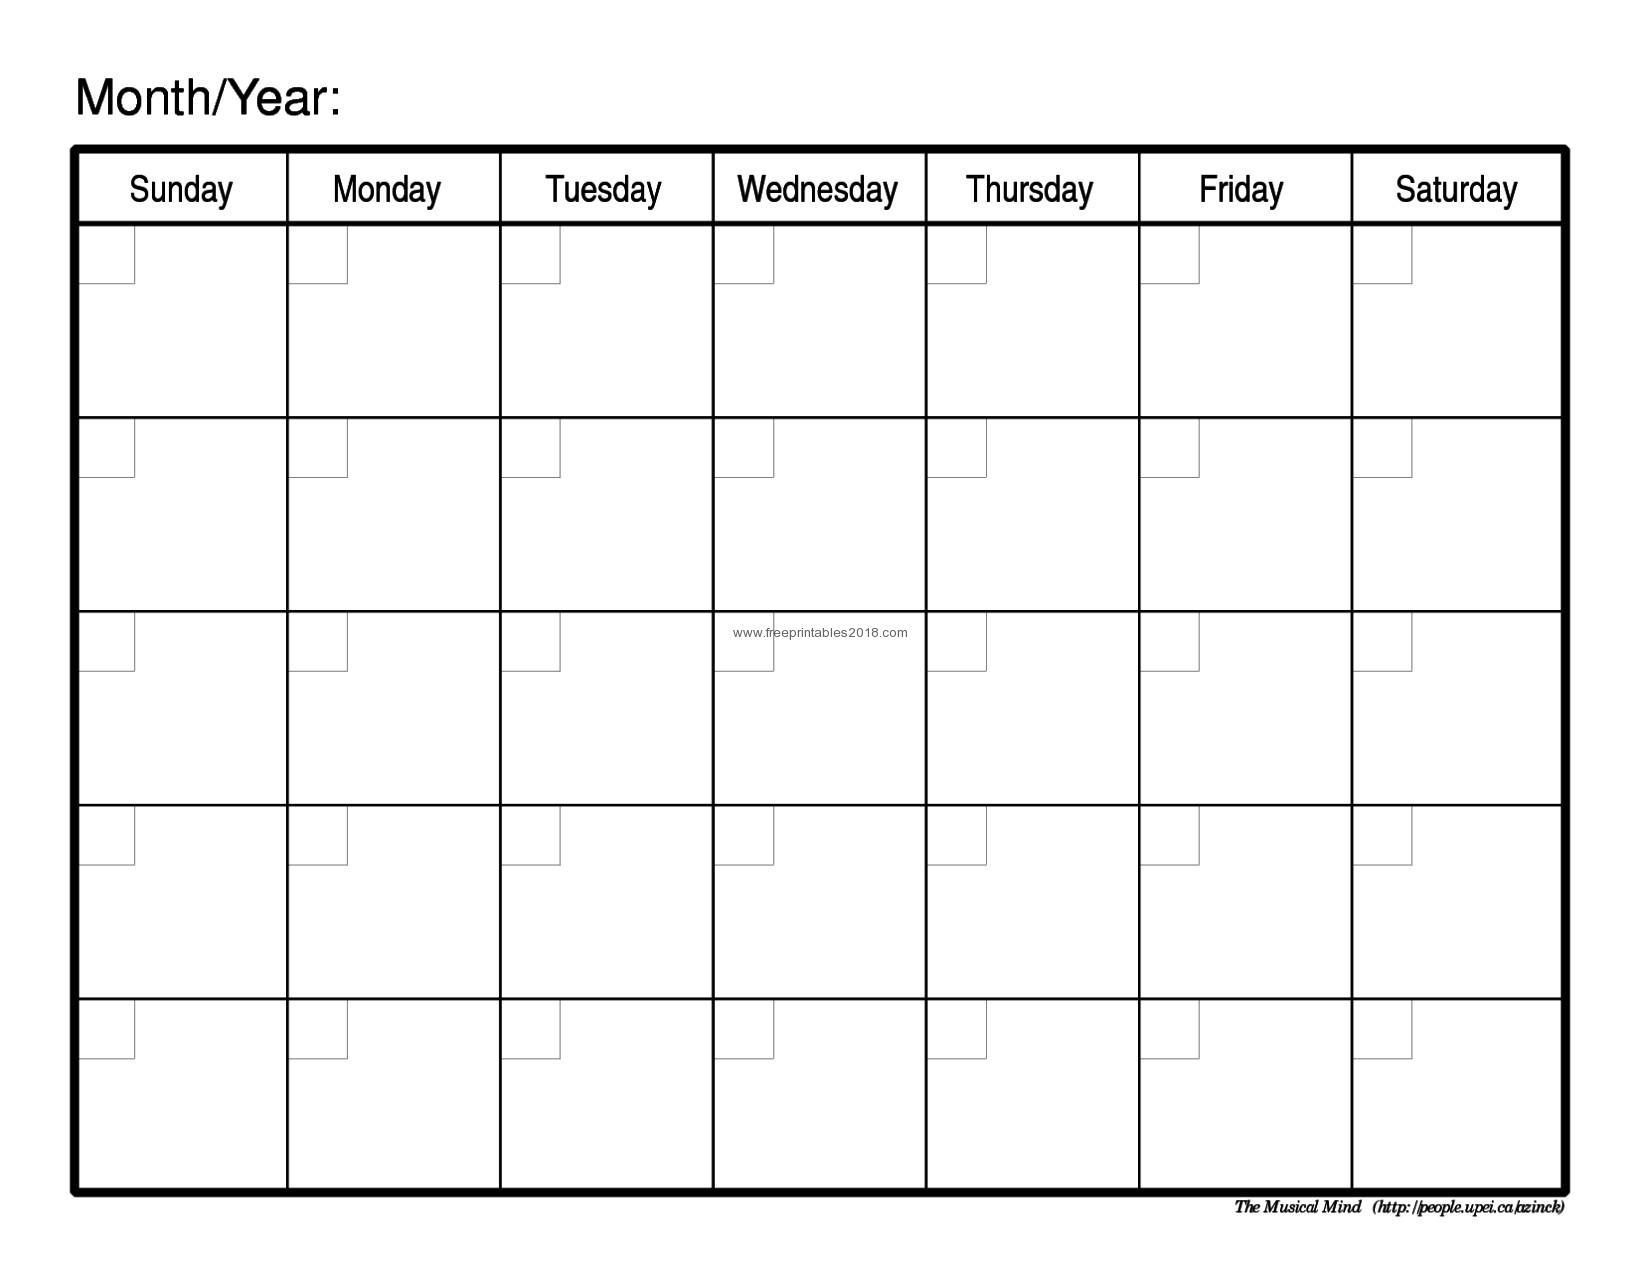 Free Printable Calendar Blank Free Printable Blank Calendar regarding Free Printable Calendar Templates Month